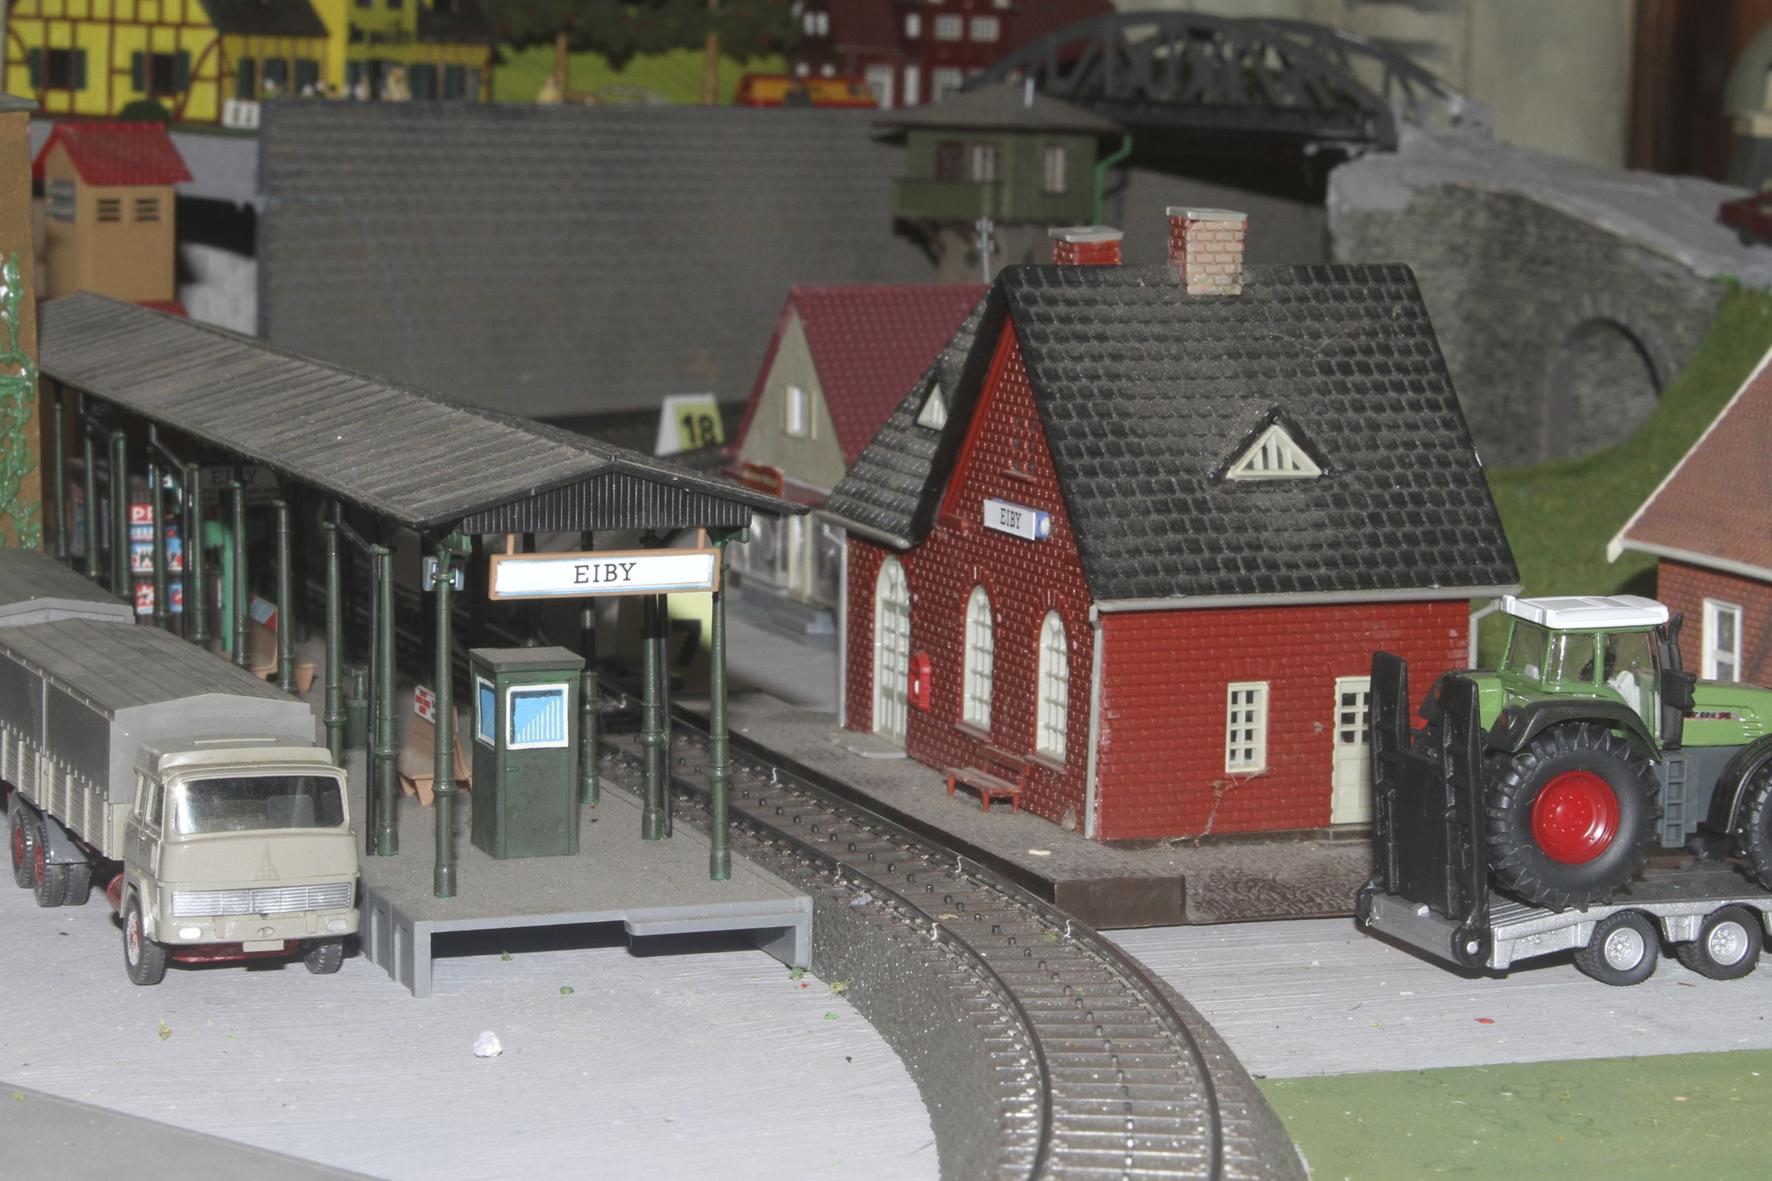 eiby-station-2